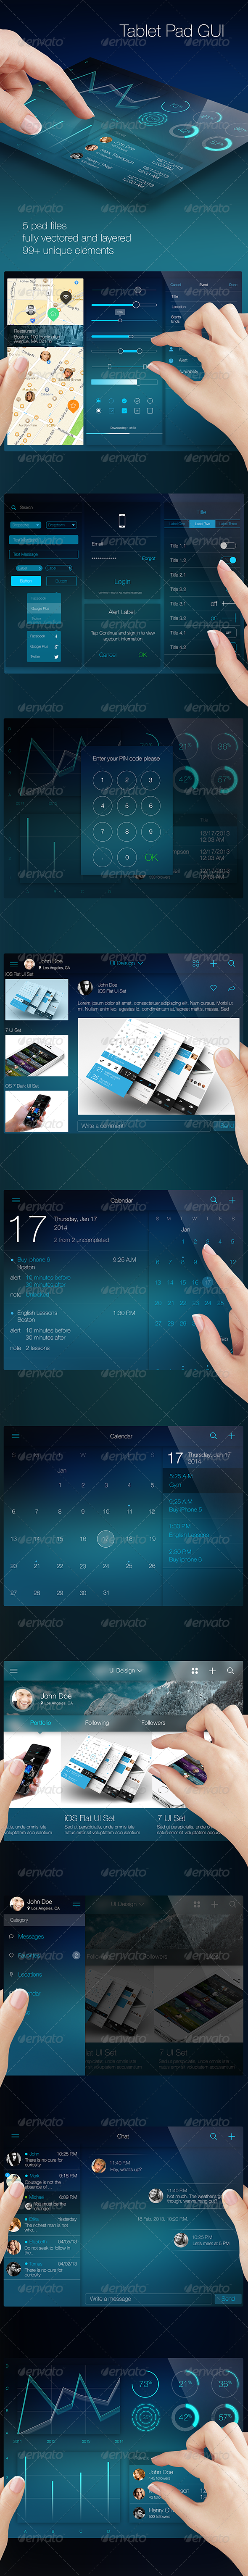 GraphicRiver iOS Tablet Flat Pad UI Set Vol 2 6877623